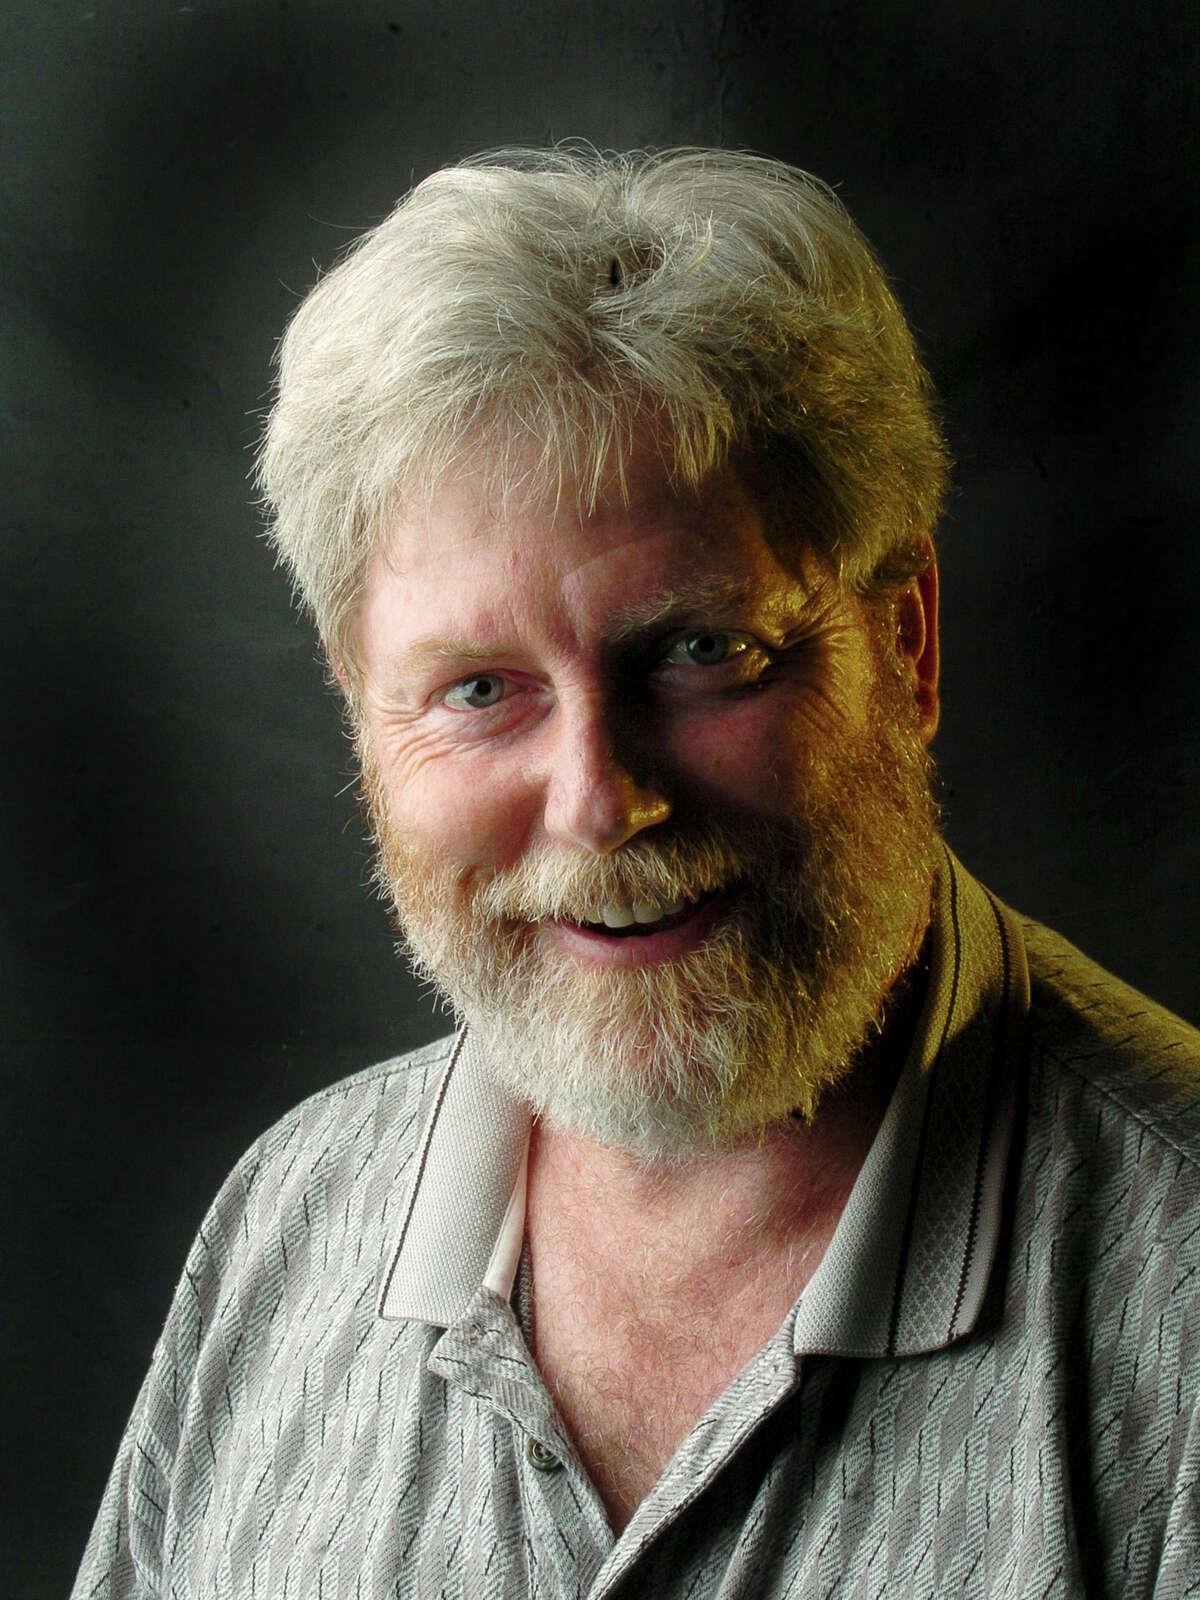 Tom Reel, photojournalist